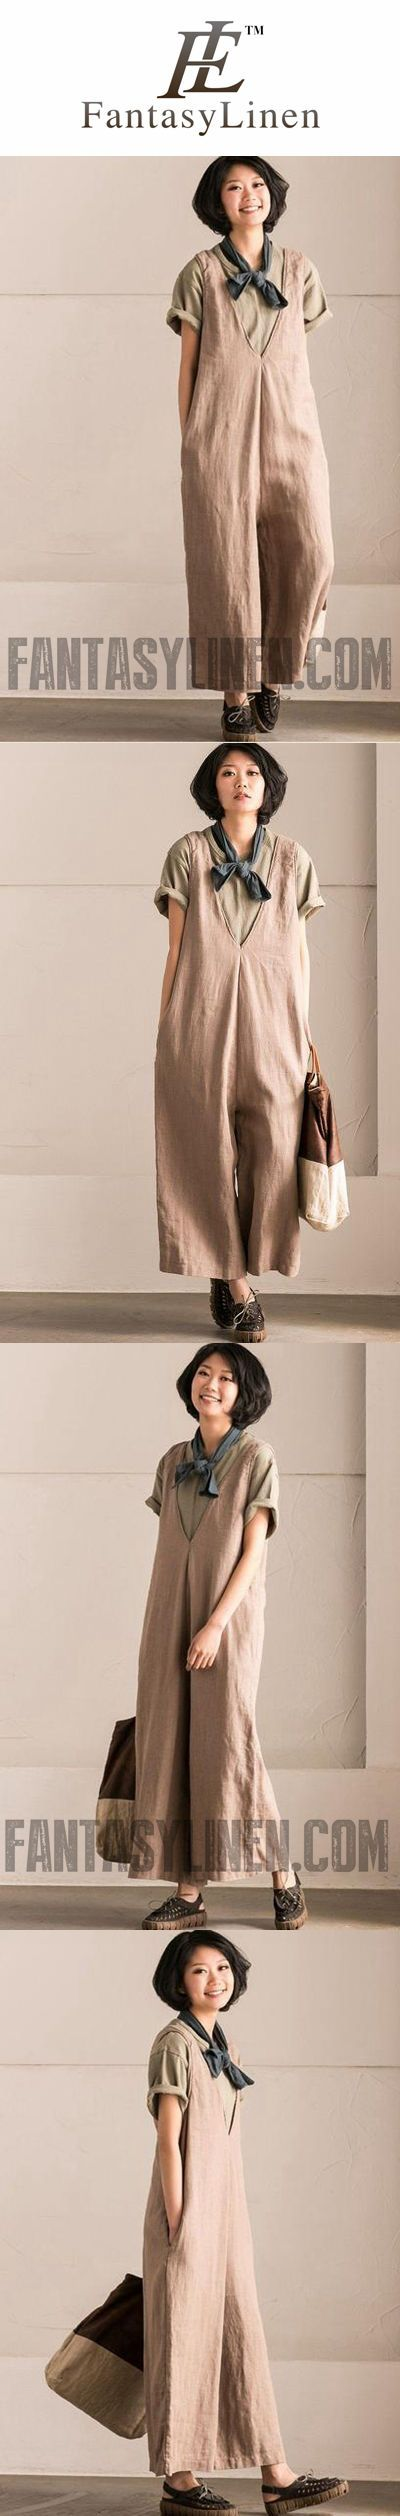 KHAKI V-NECK CAUSAL COTTON LINEN OVERSIZE OVERALLS WOMEN CLOTHES K289BG